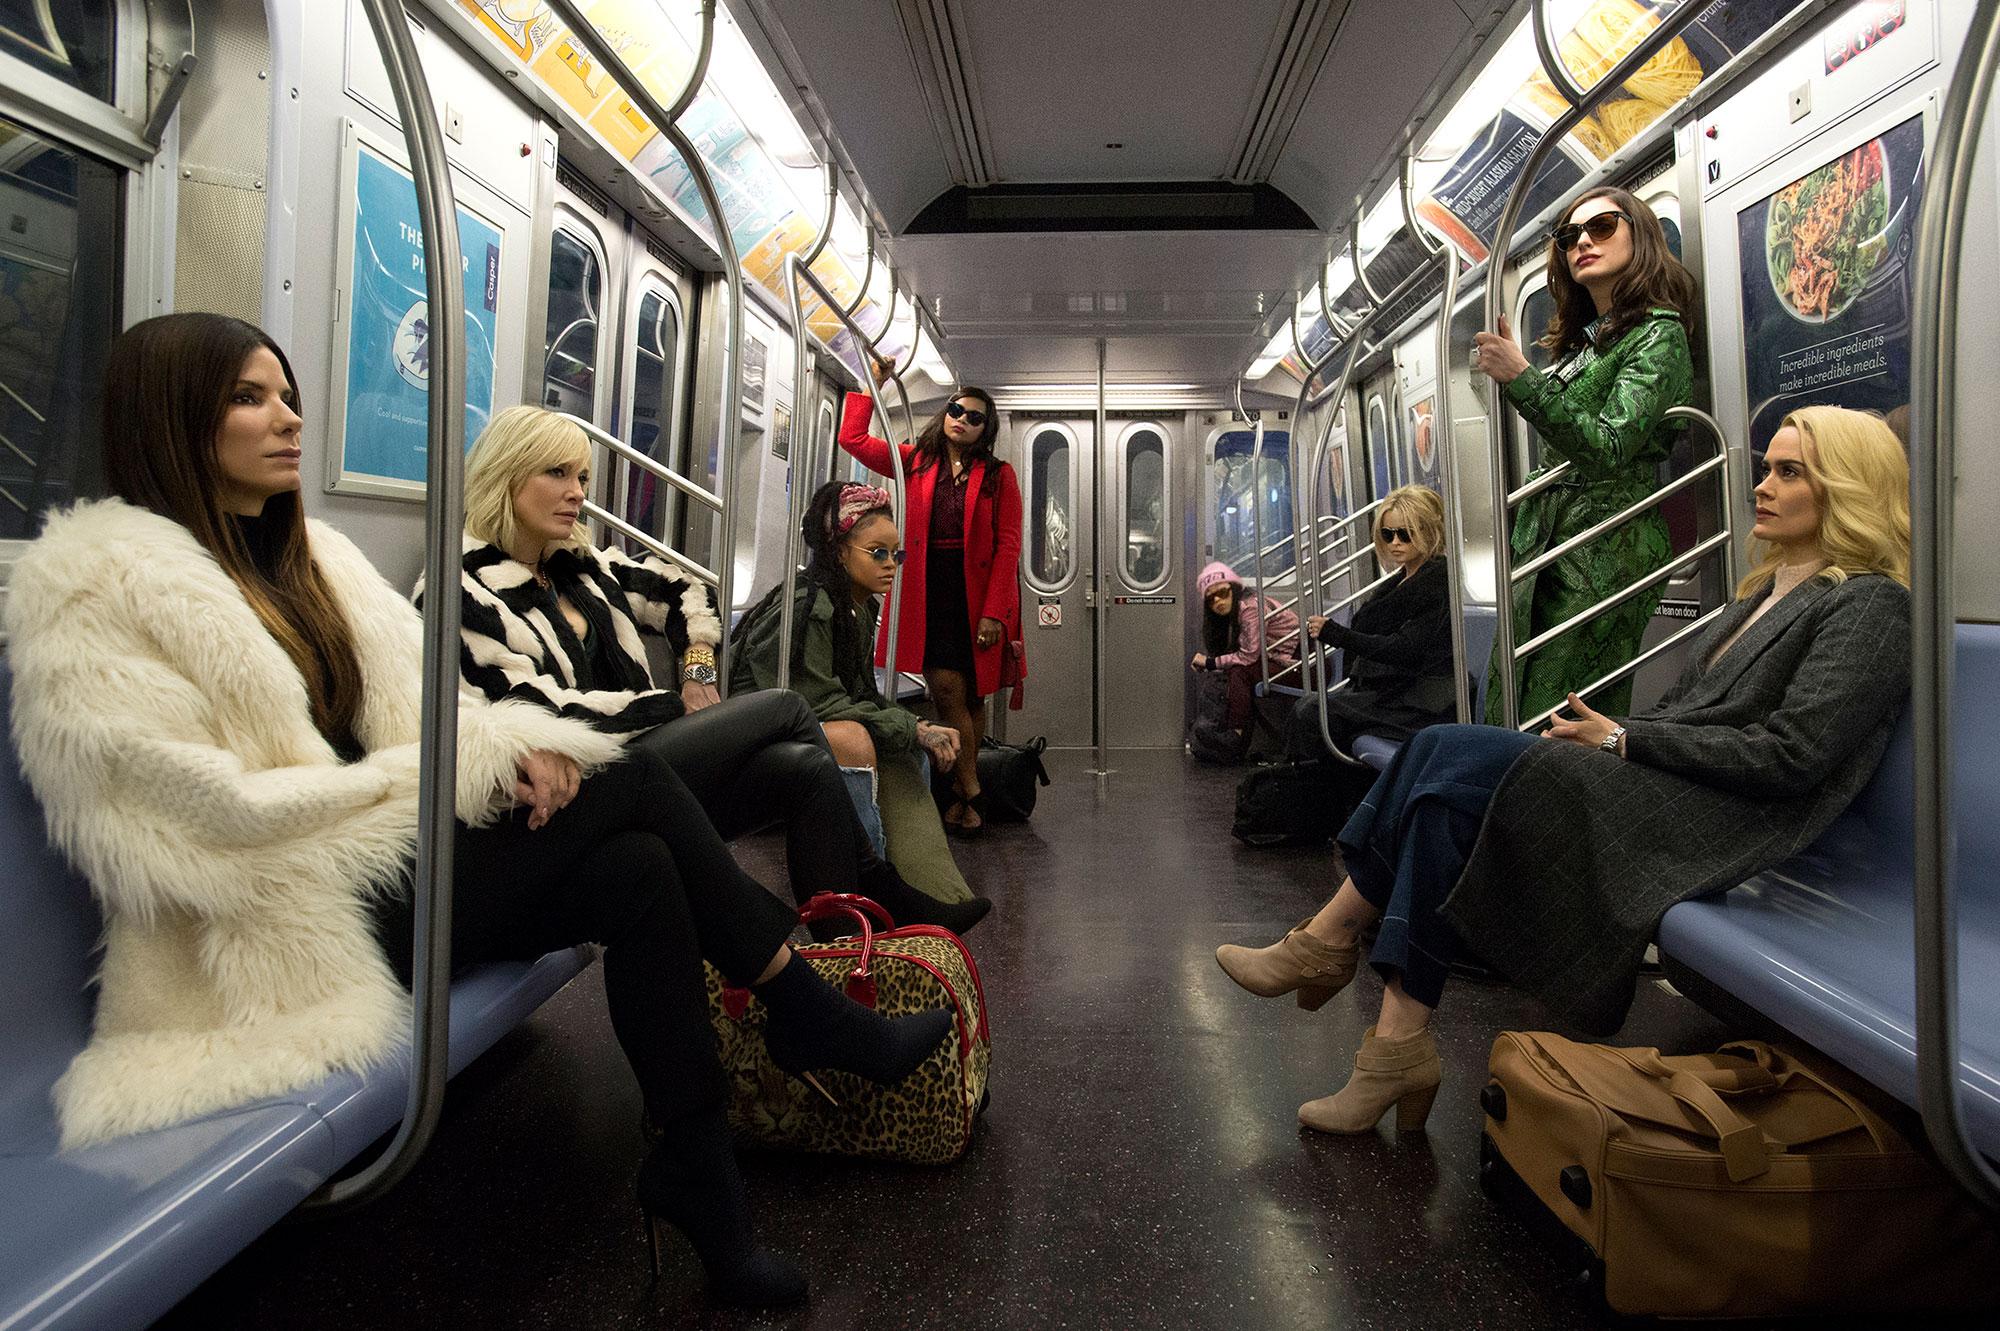 Sandra Bullock, Rihanna, Mindy Kaling, Cate Blanchett, Anne Hathaway, Helena Bonham Carter, Sarah Paulson, Awkwafina Ocean's Eight